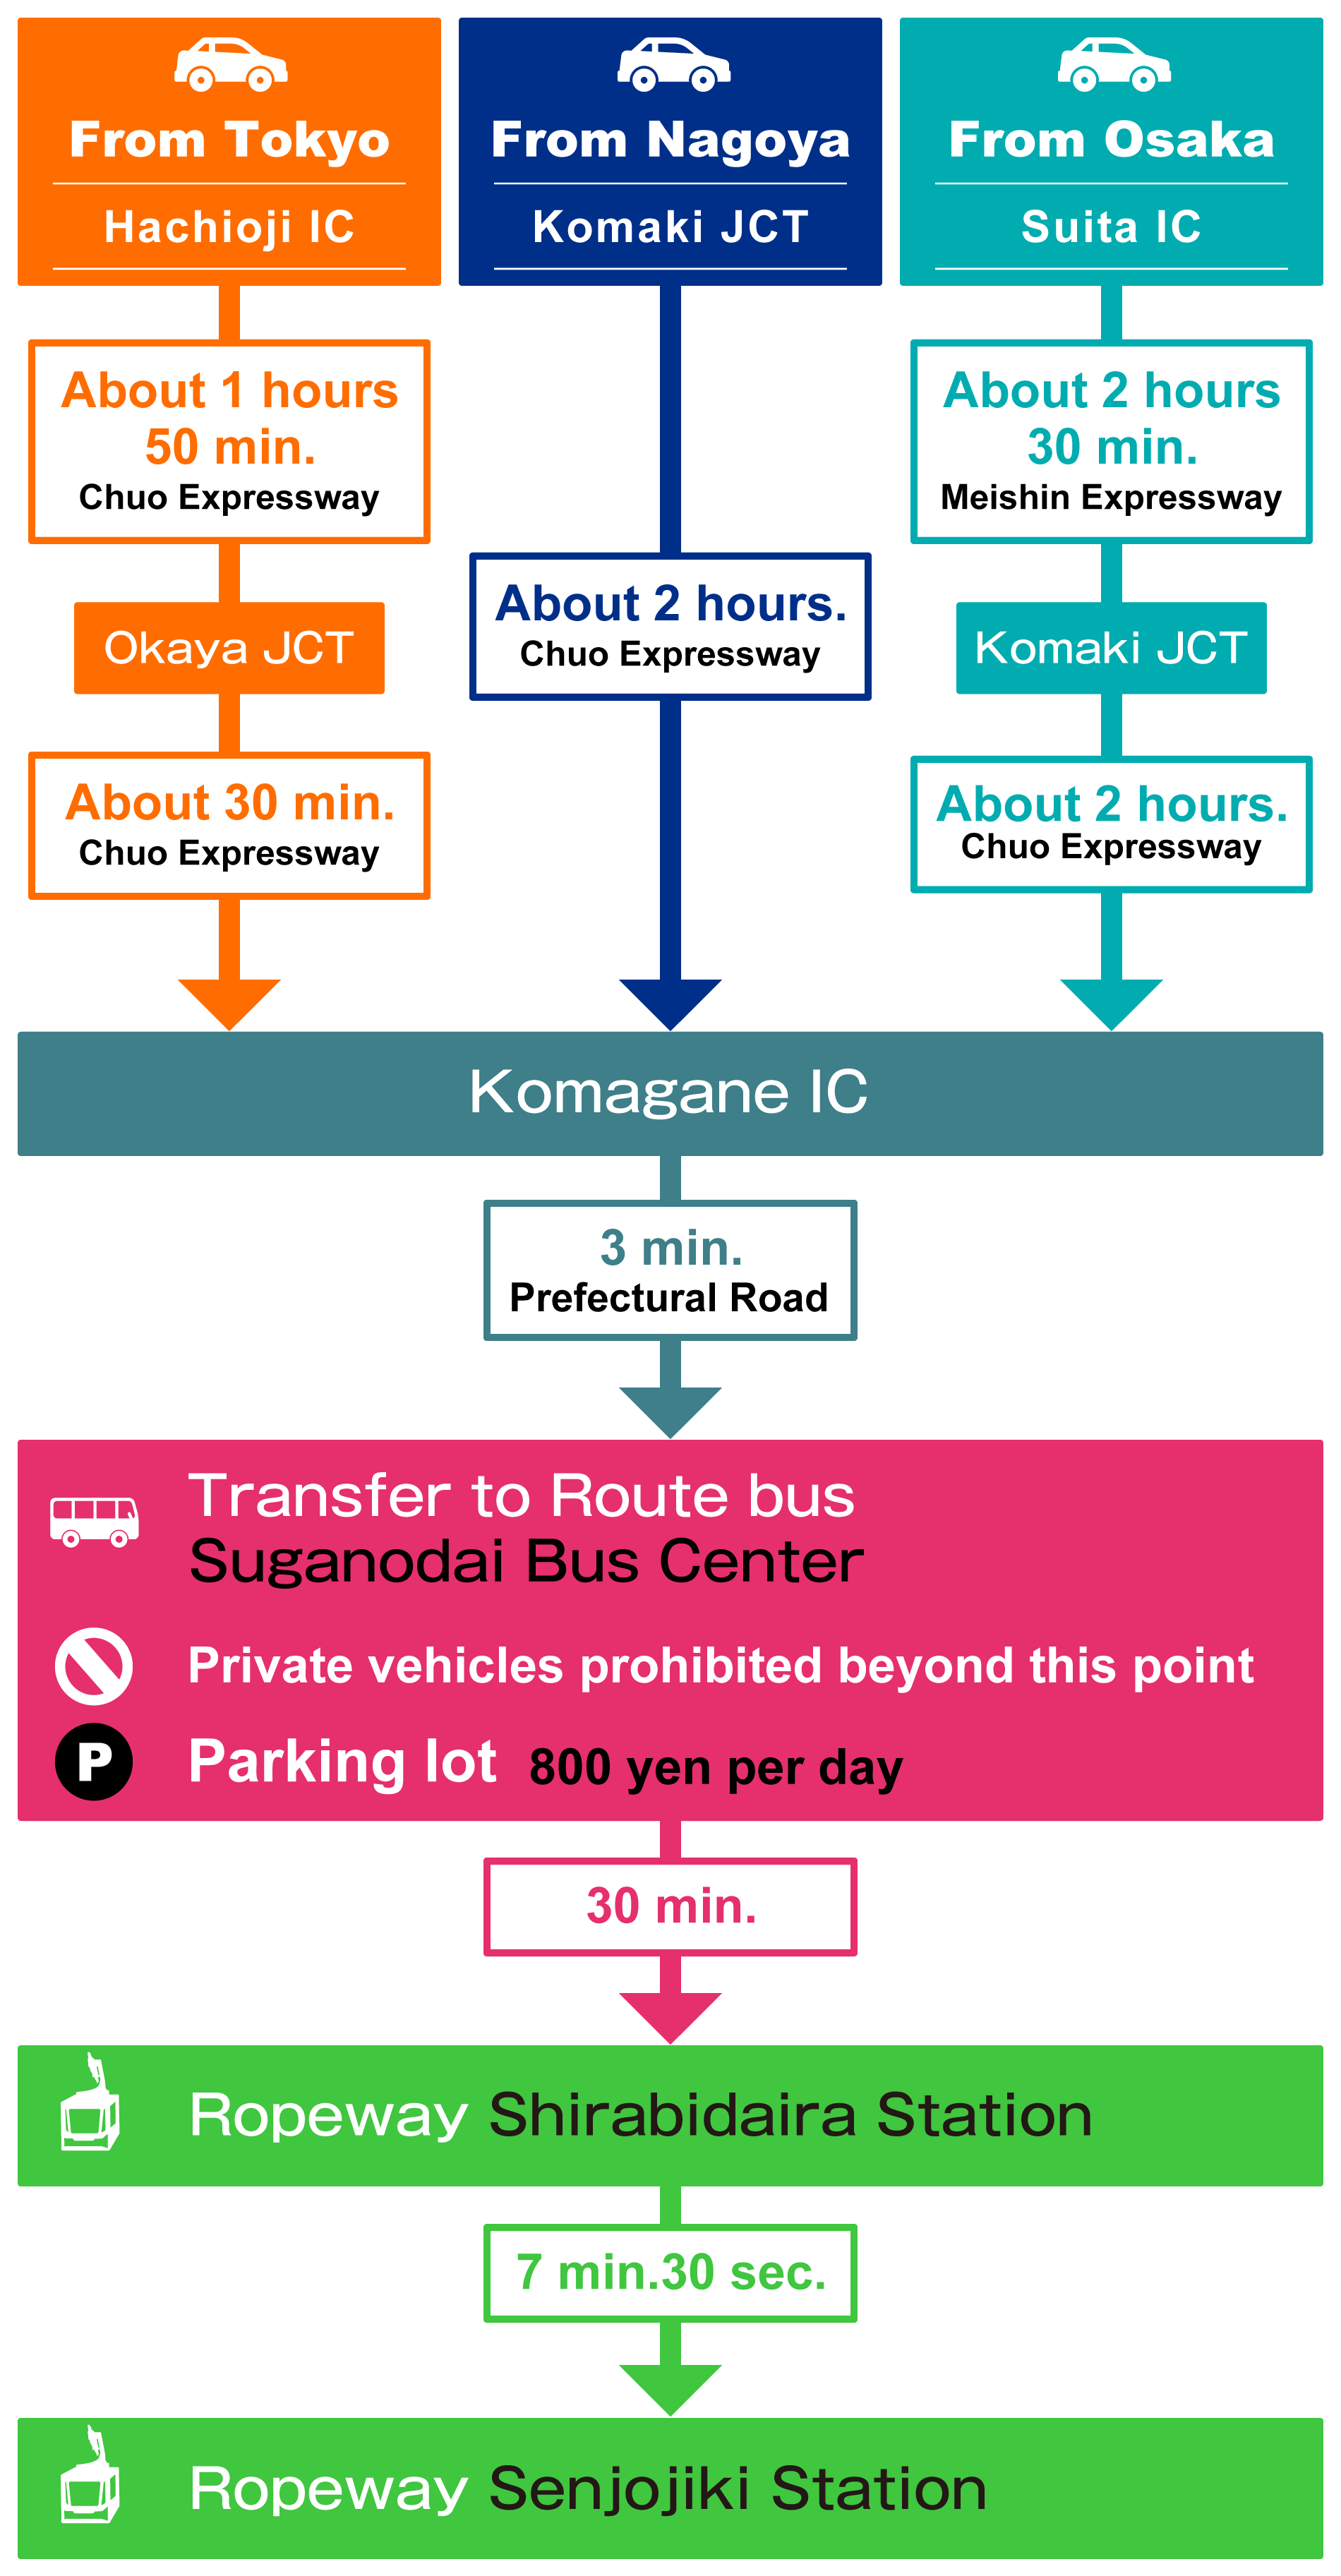 access-car-en-201906